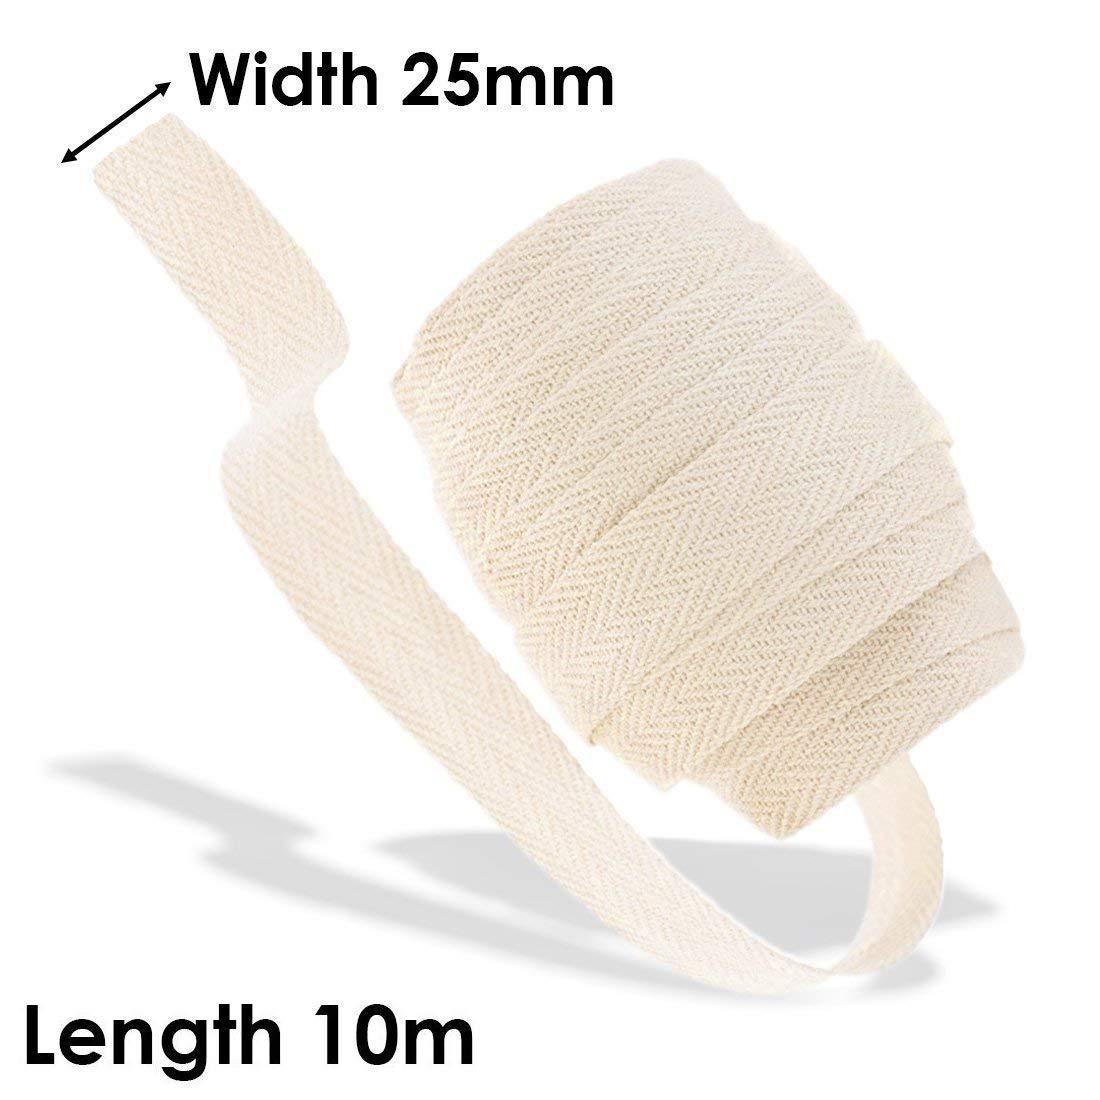 Bunting Binding Apron Webbing Sew NATURAL CREAM 25mm Cotton Herringbone Tape